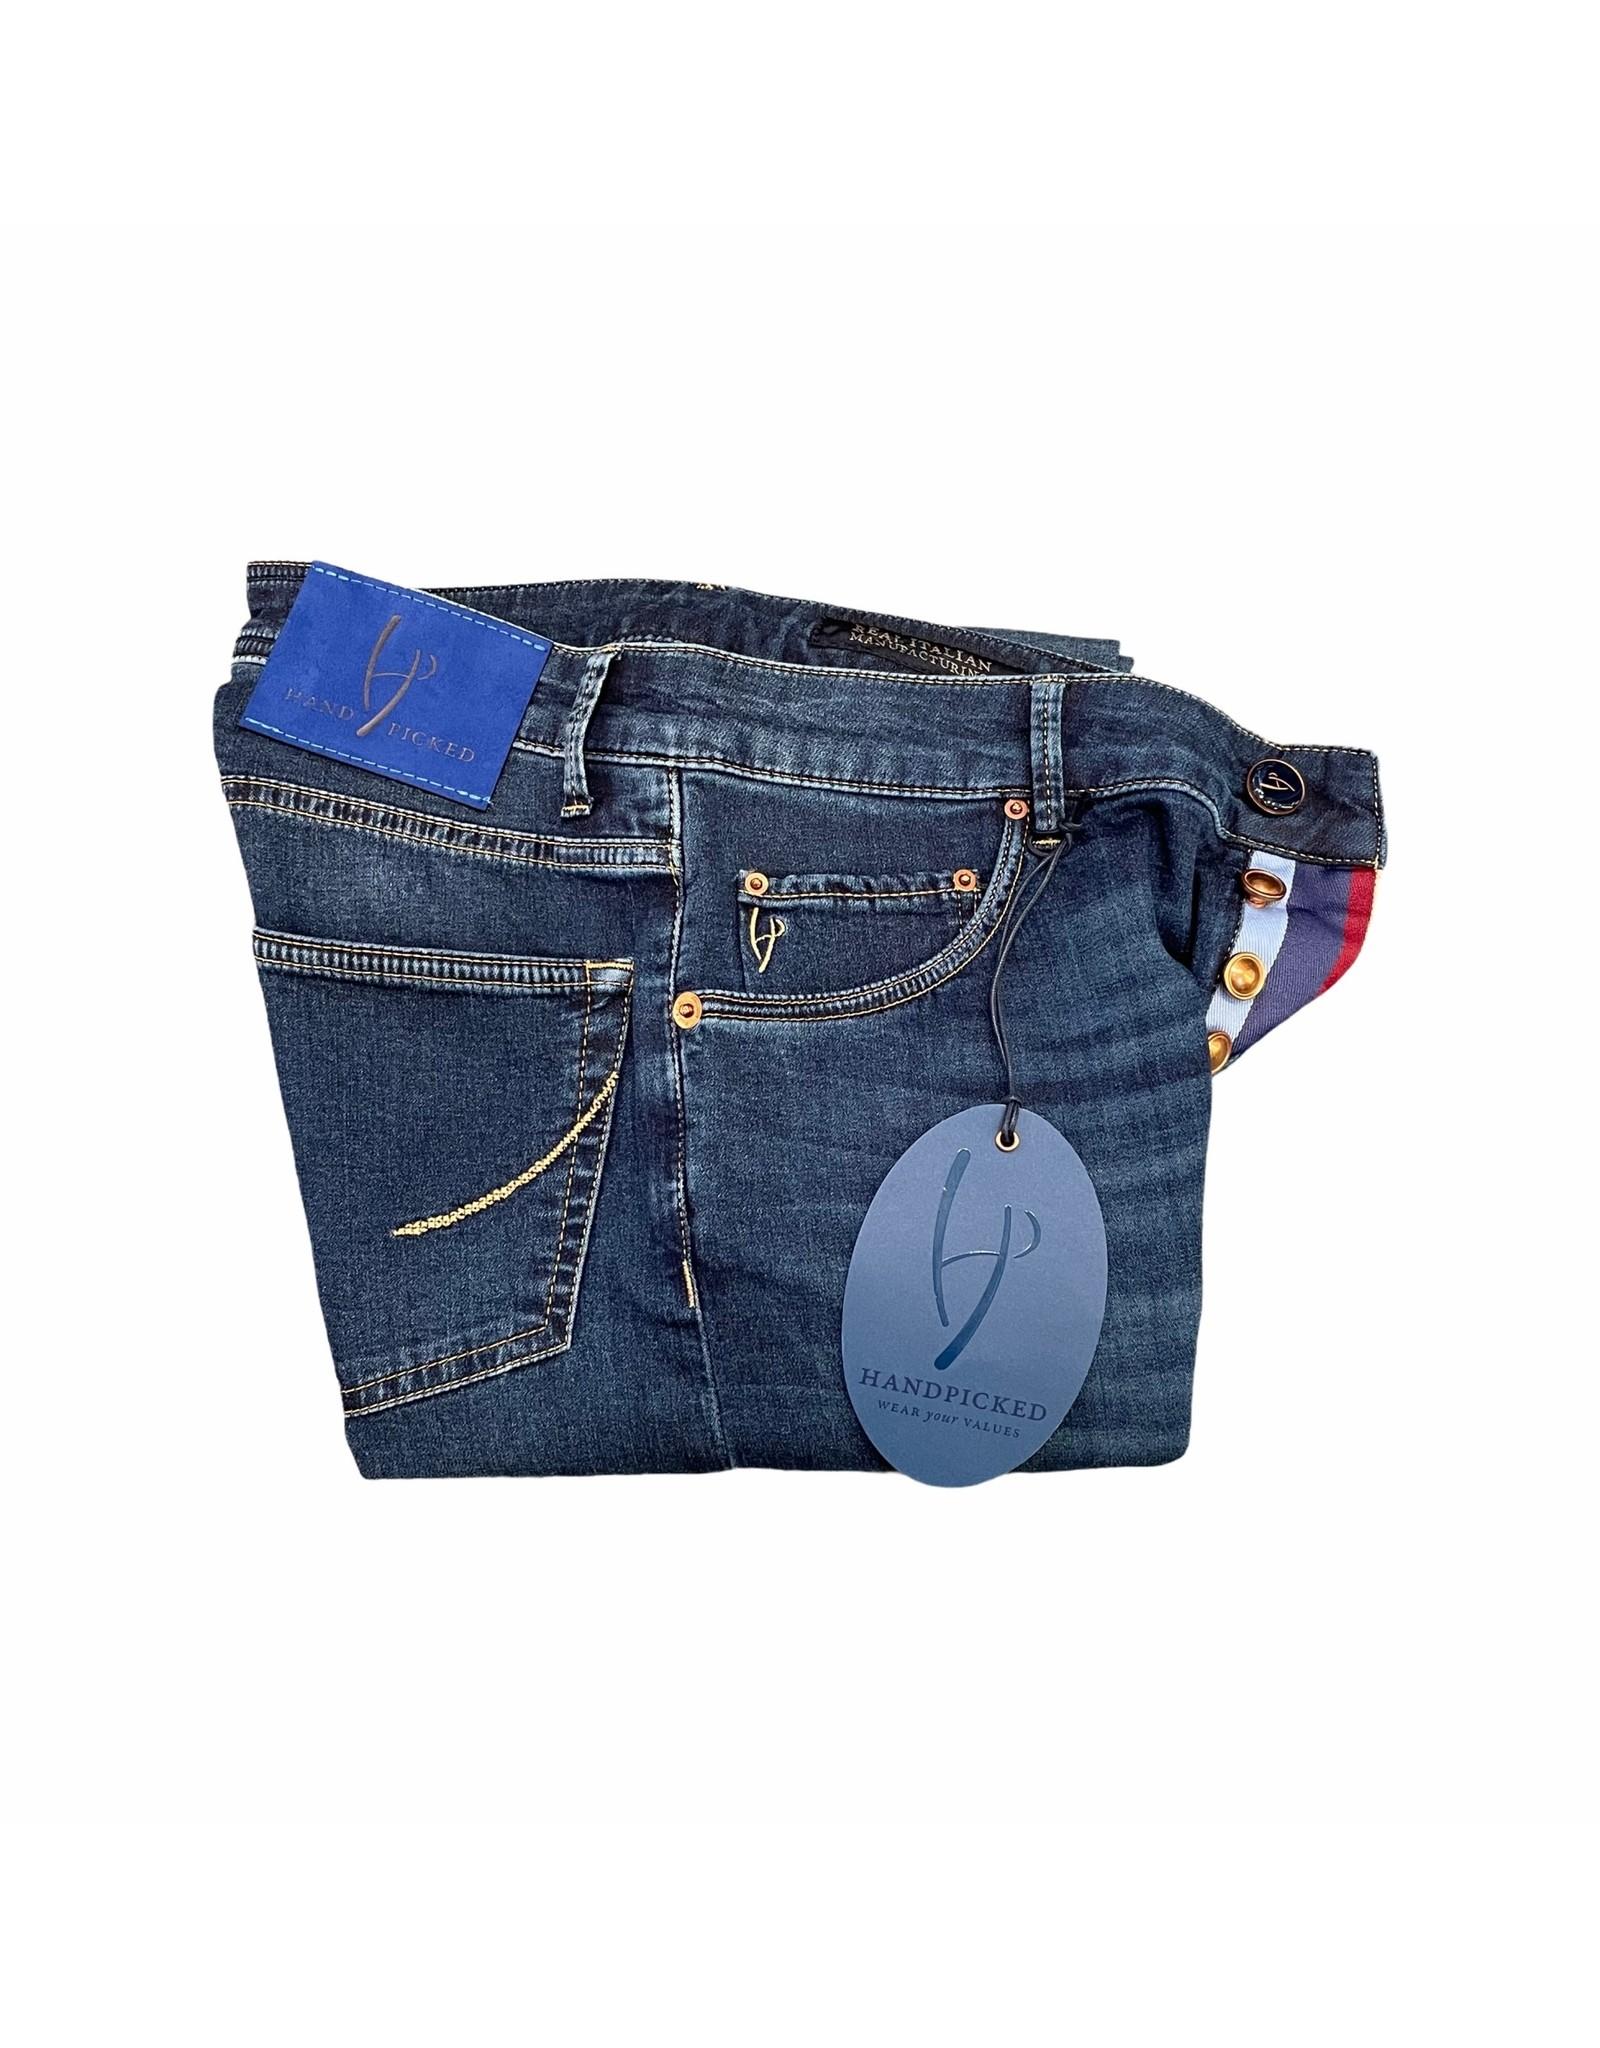 Hand Picked 21/1 Hand Picked  Jeans ORVIETO-C  01969 W2